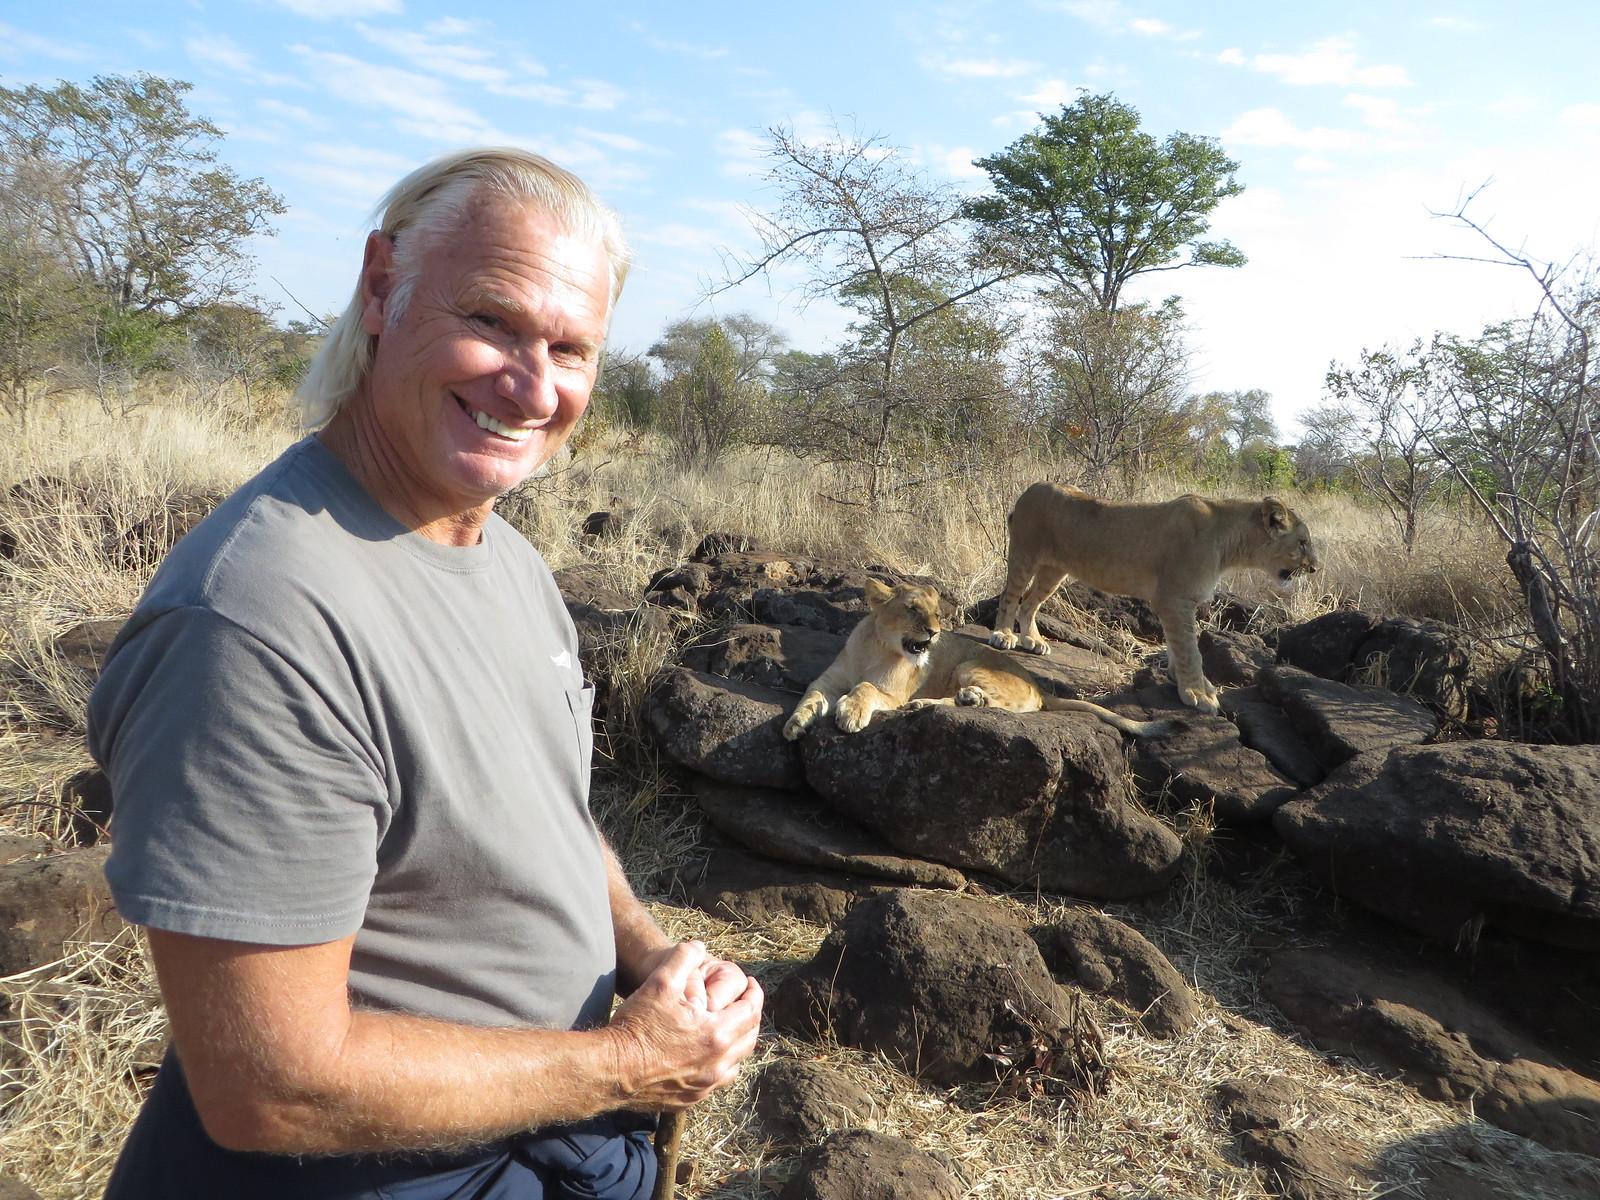 Rest break for the lion cubs. Bill observes.